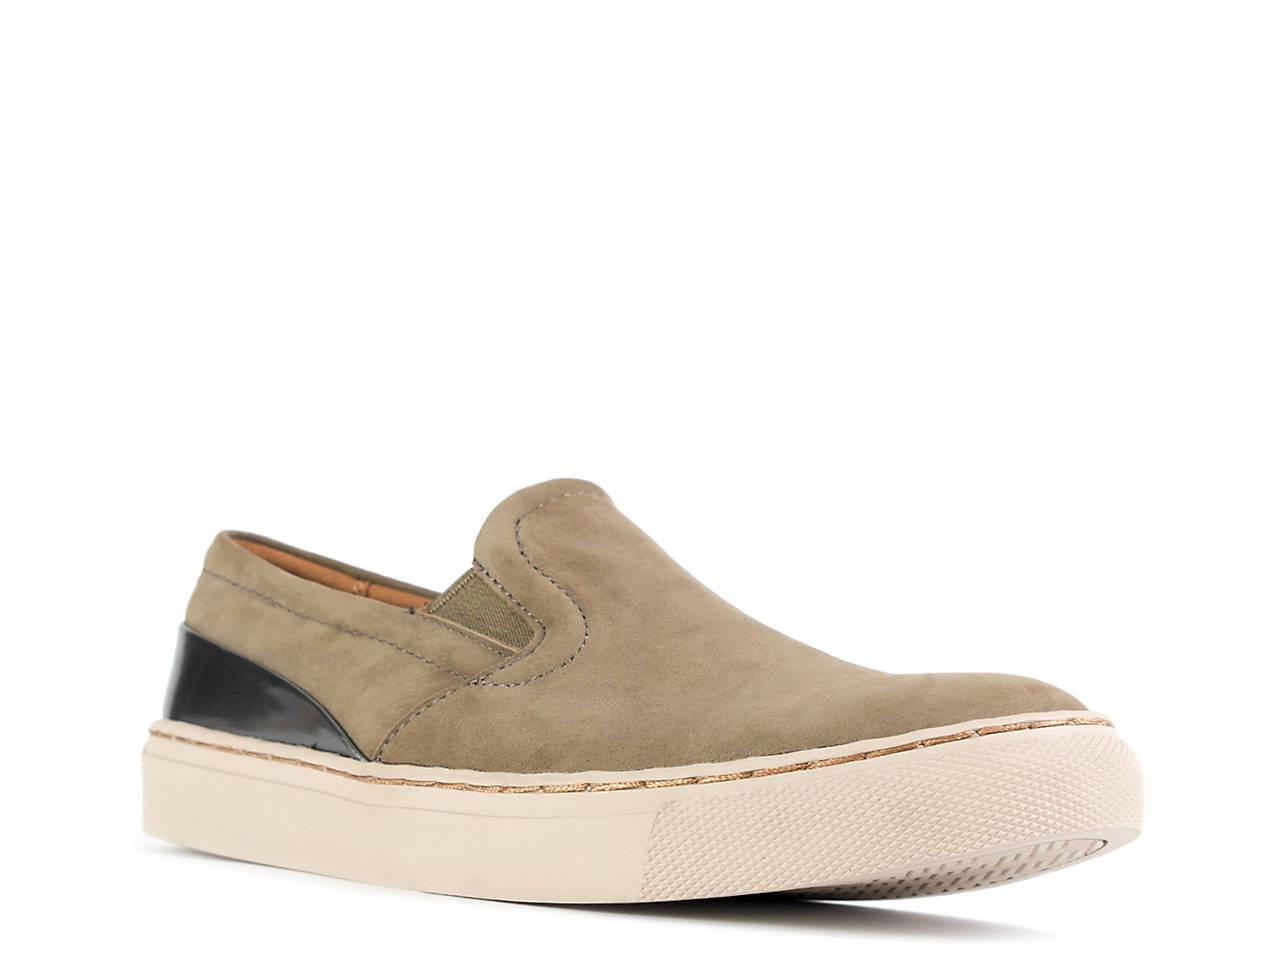 ccfd5cce3ef3 Cougar Flip Slip-On Women s Shoes